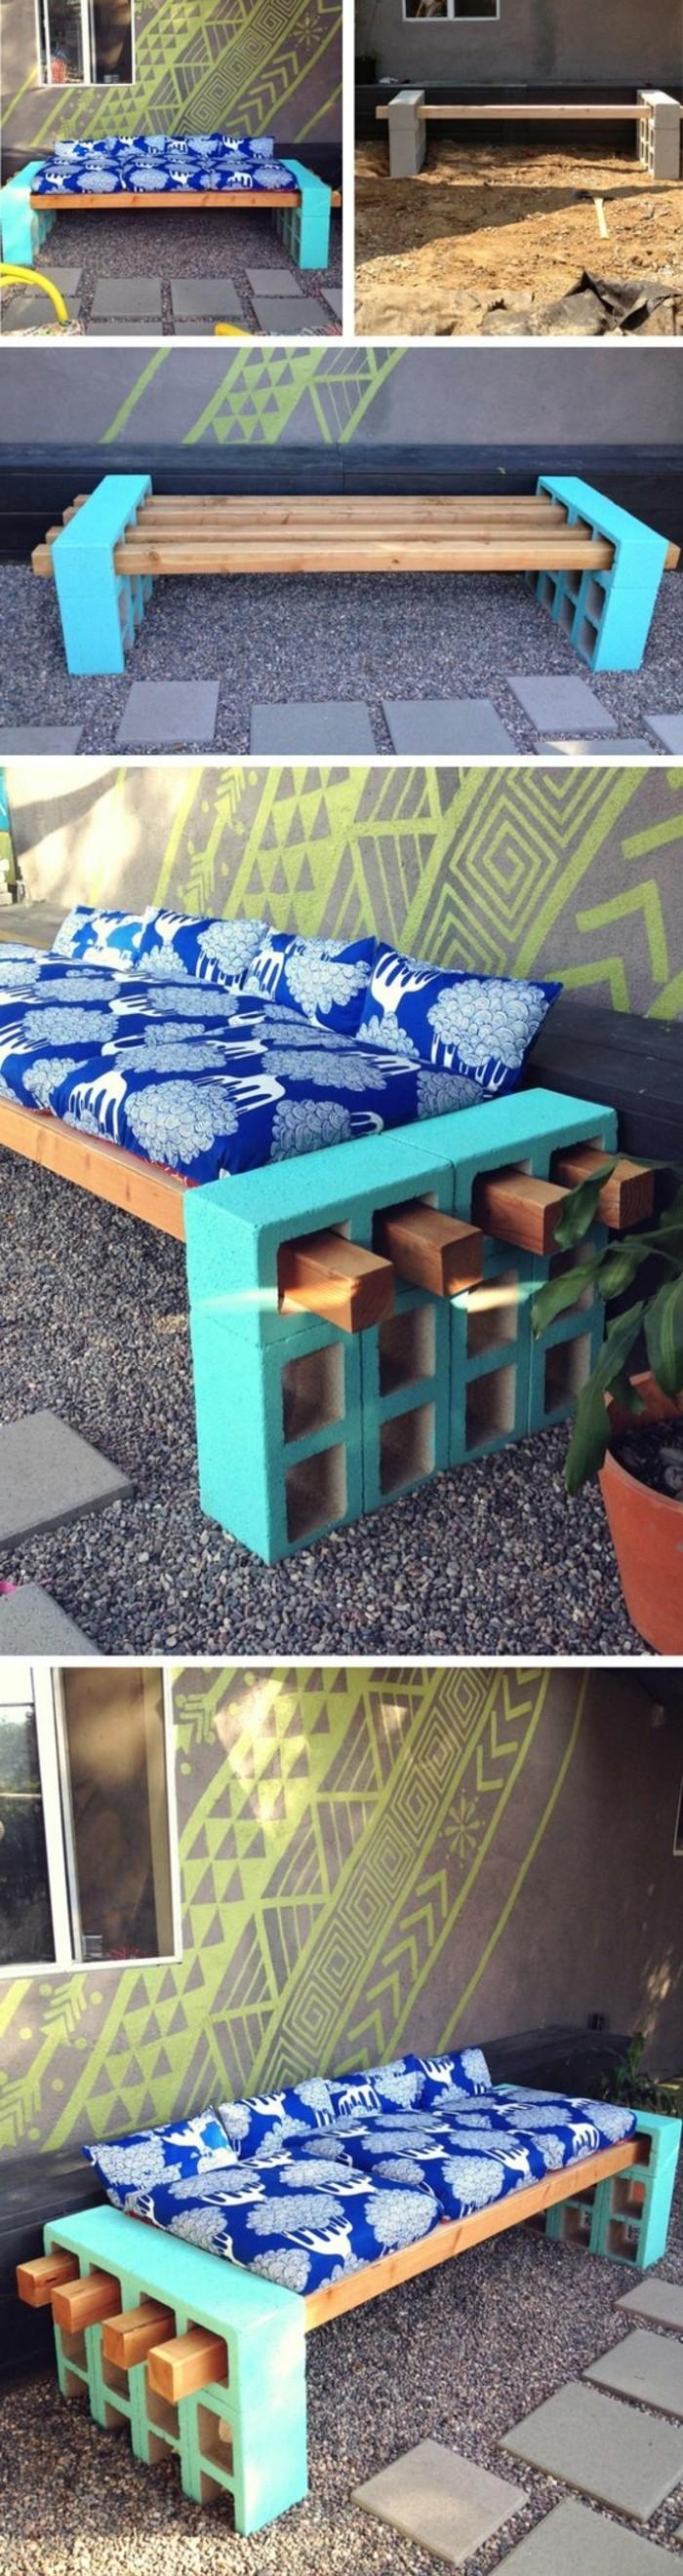 diy-moebel-wohnideen-seoeber-machen-blauer-sofa-aus-holz